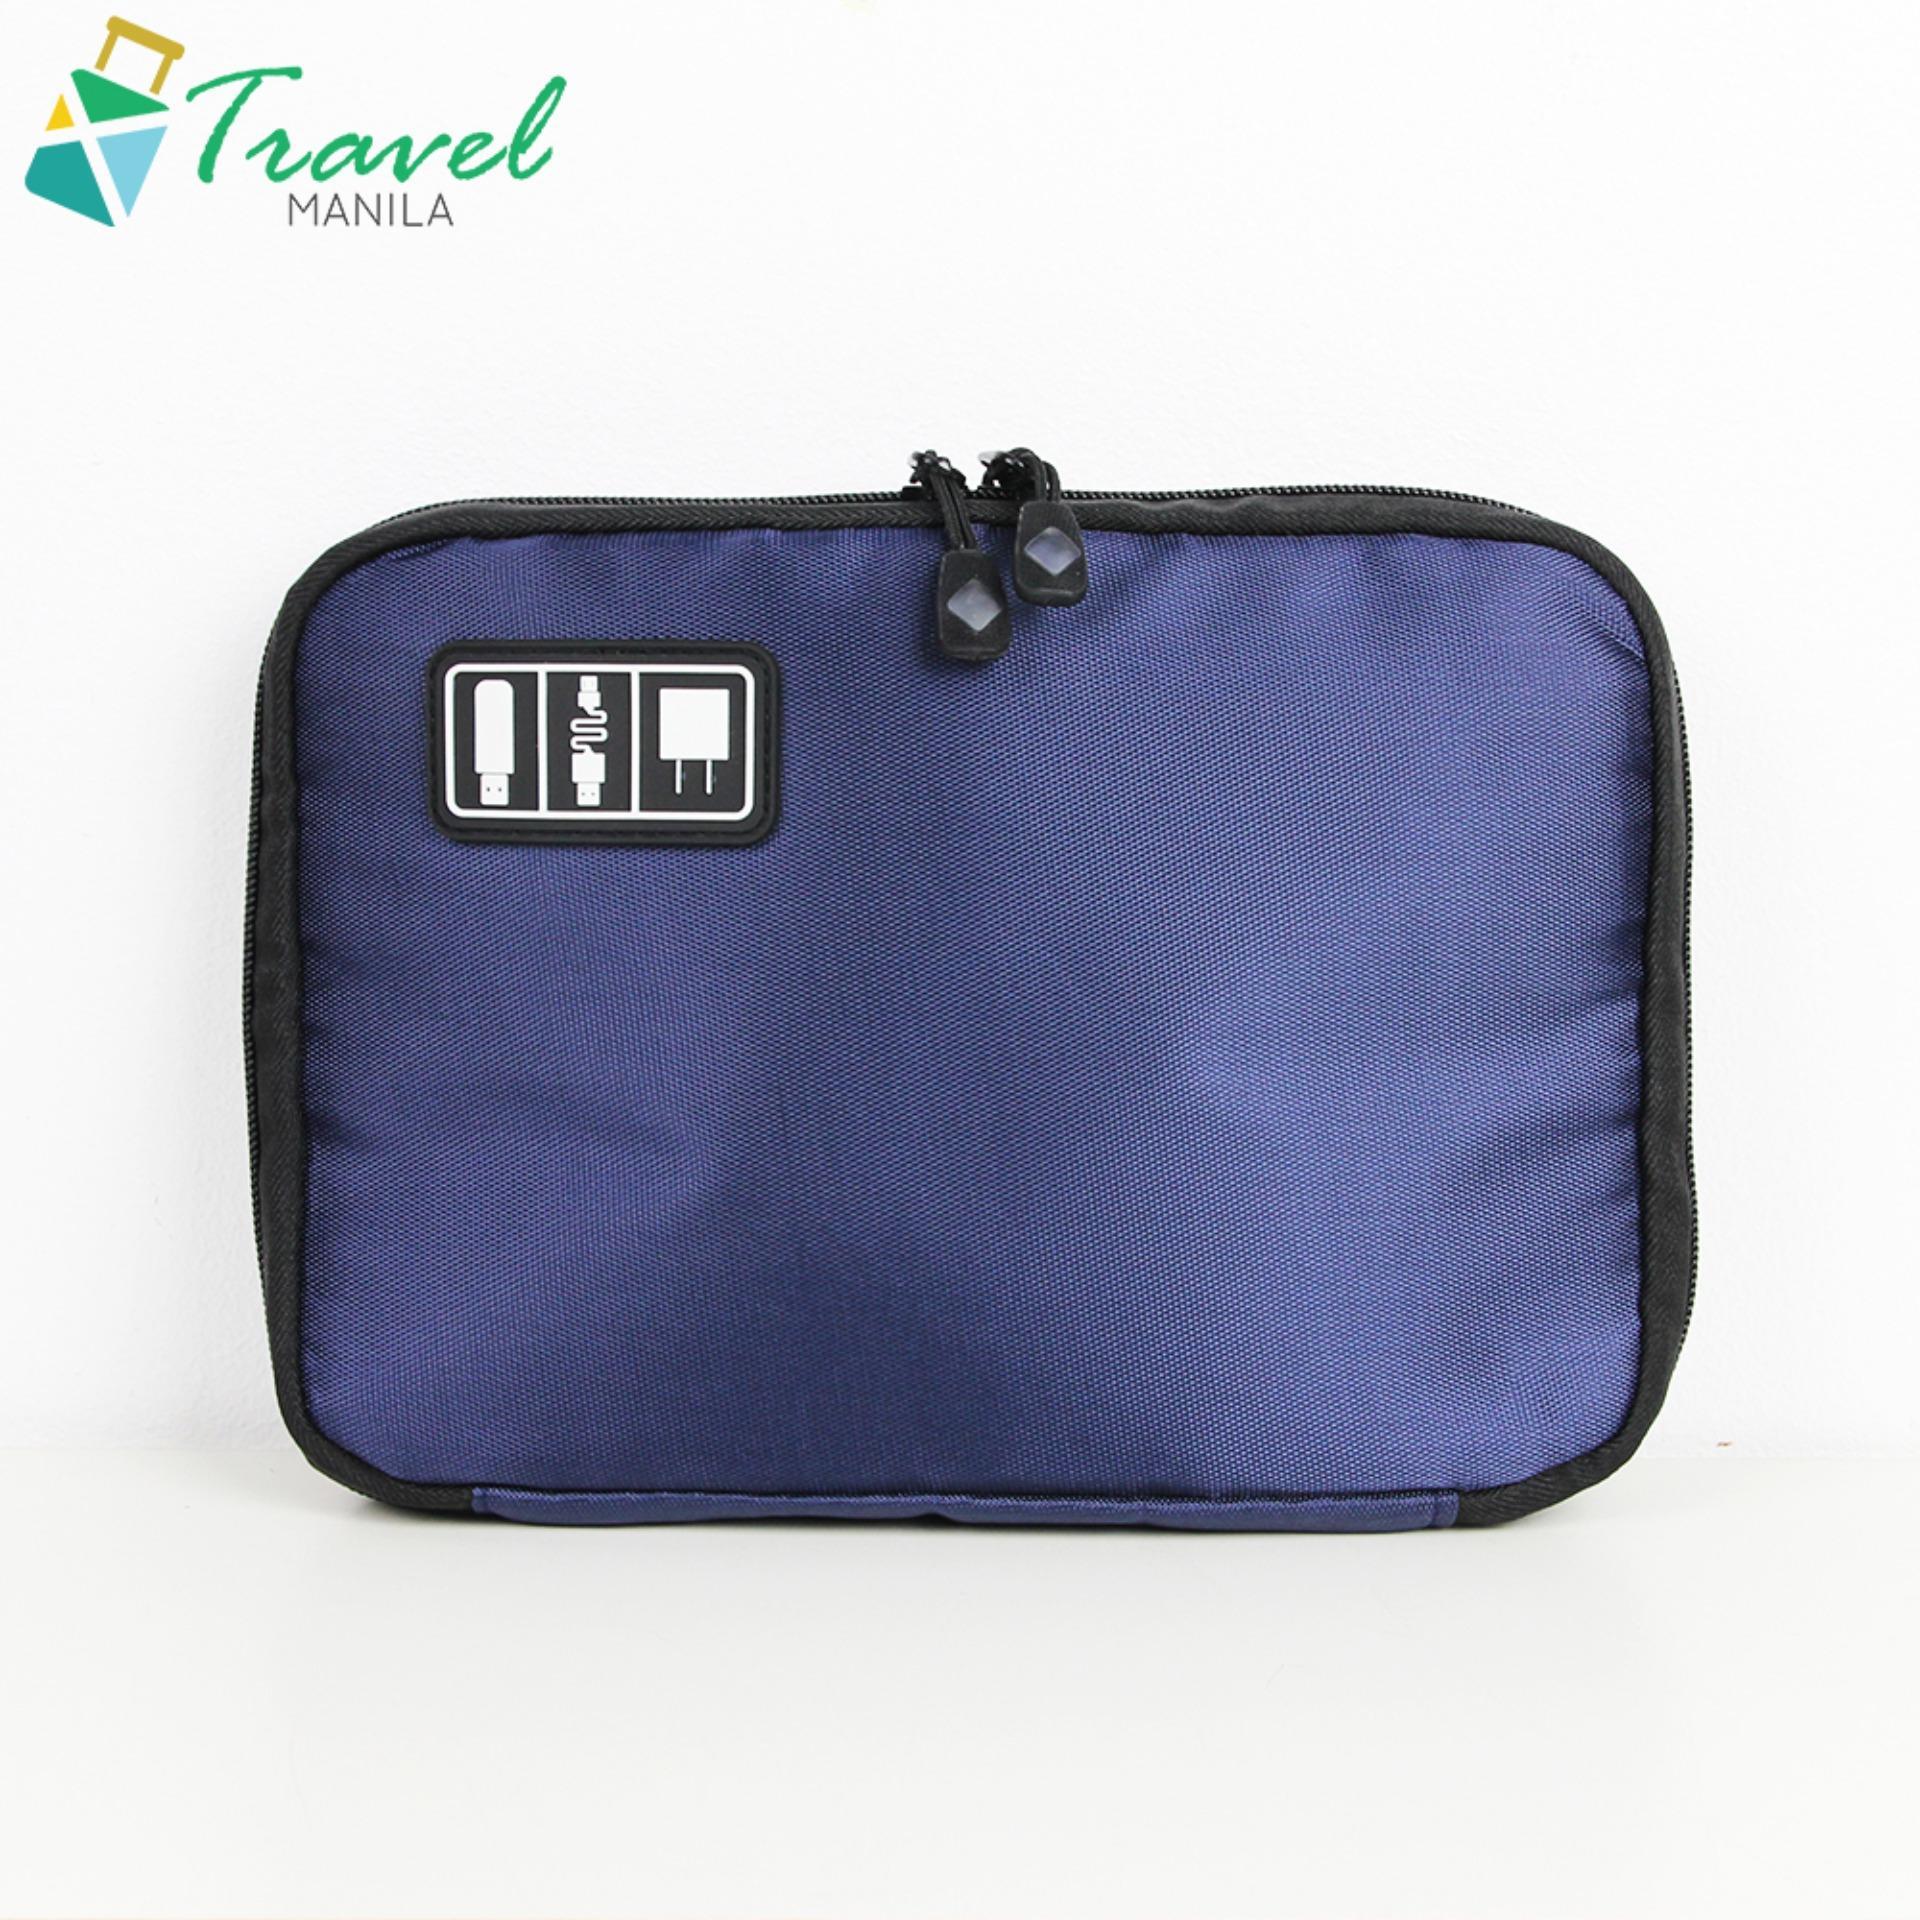 Philippines Medium Size Gadget Organizer Kit Bag Eshop Checker